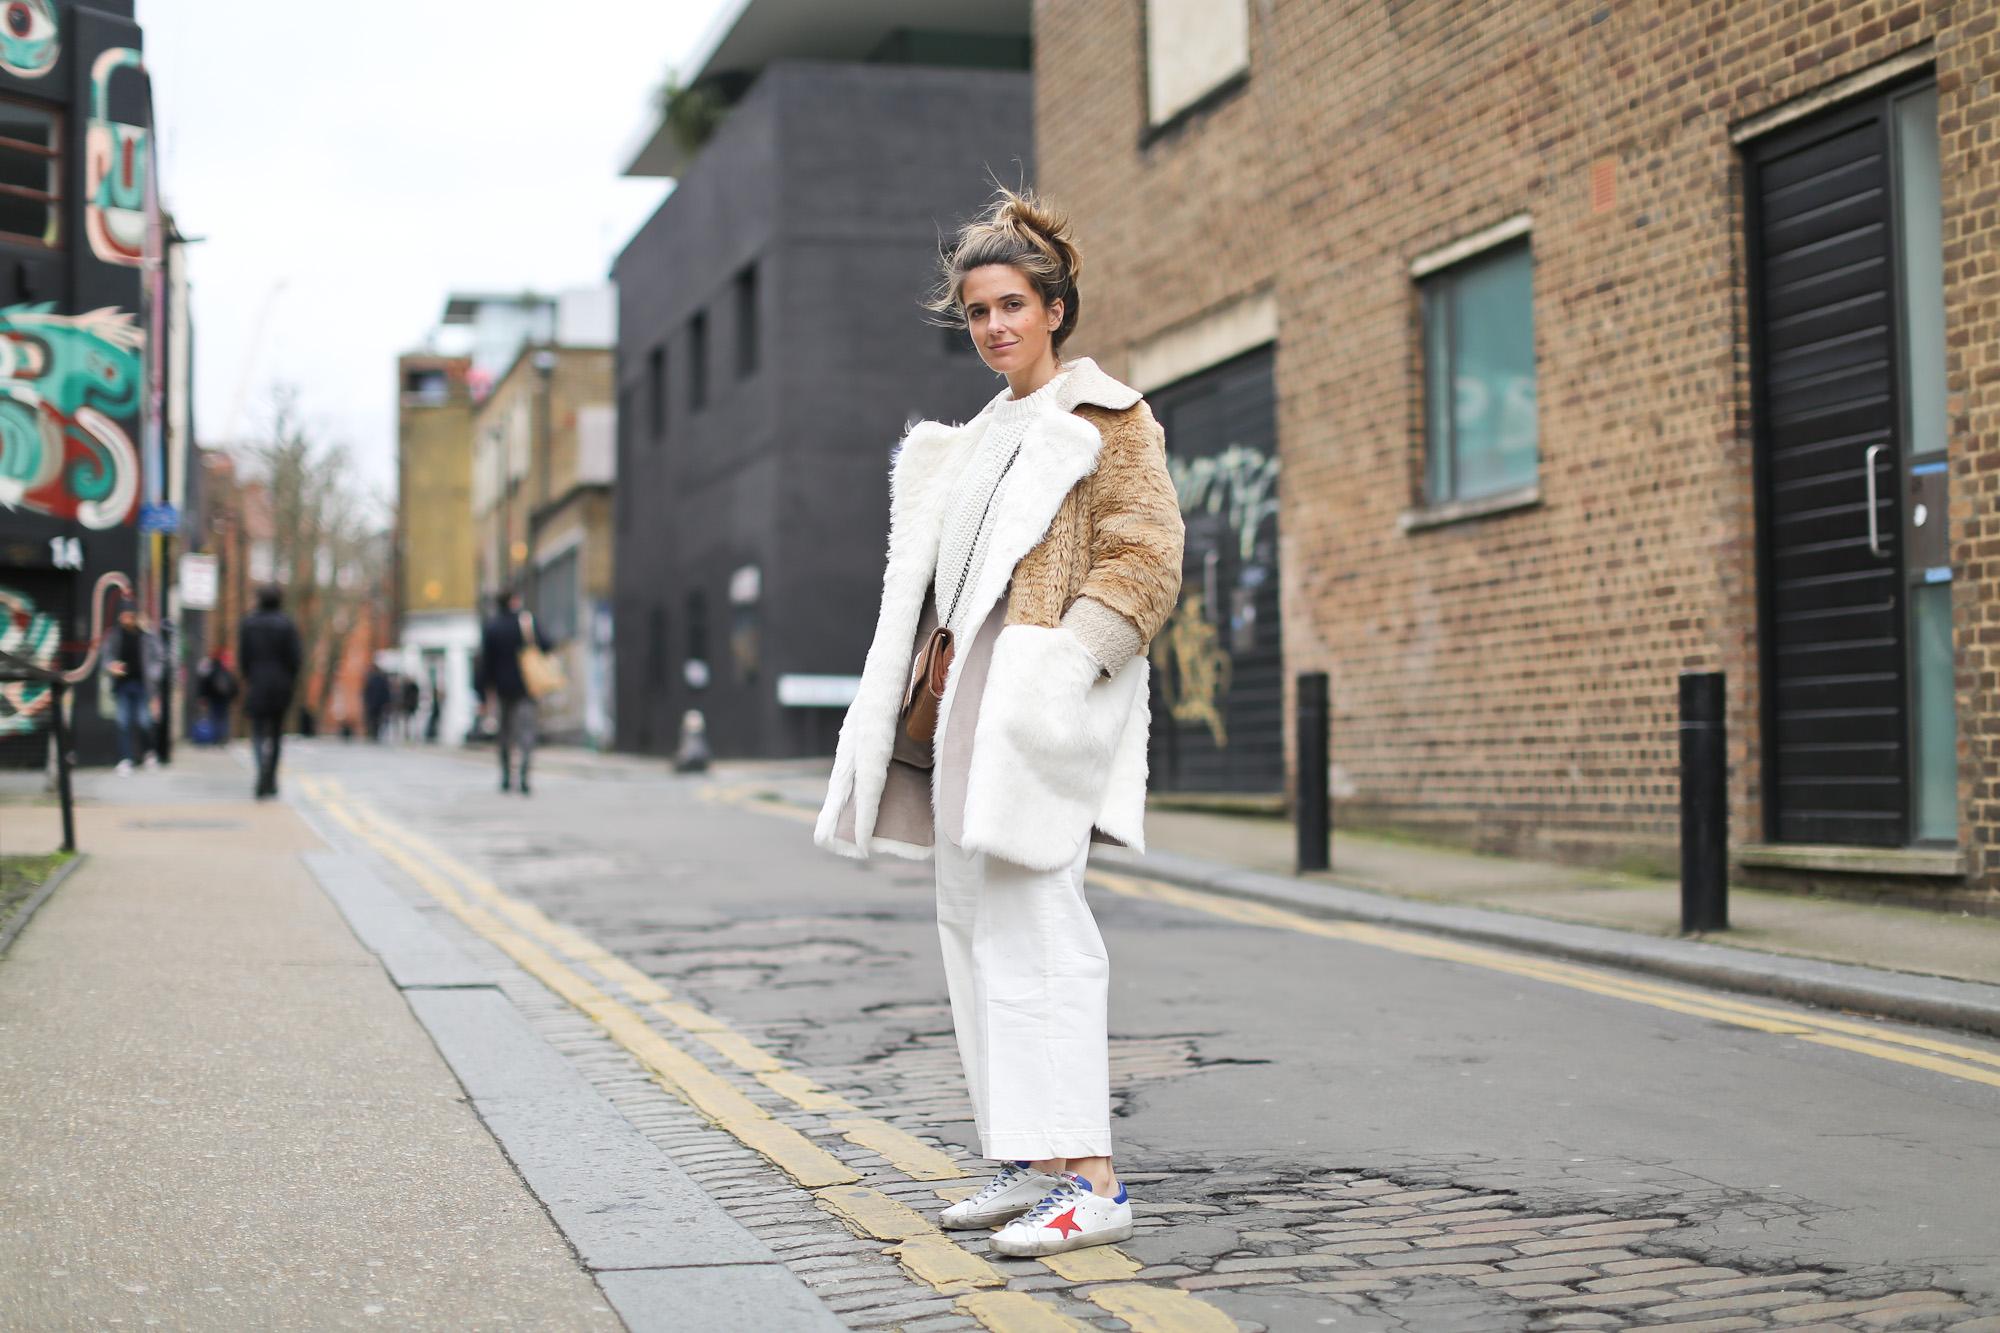 Clochet_streetstyle_asos_patchwork_faux_fur_coat_goldengoose_superstar_sneakers_topshopunique_show-2